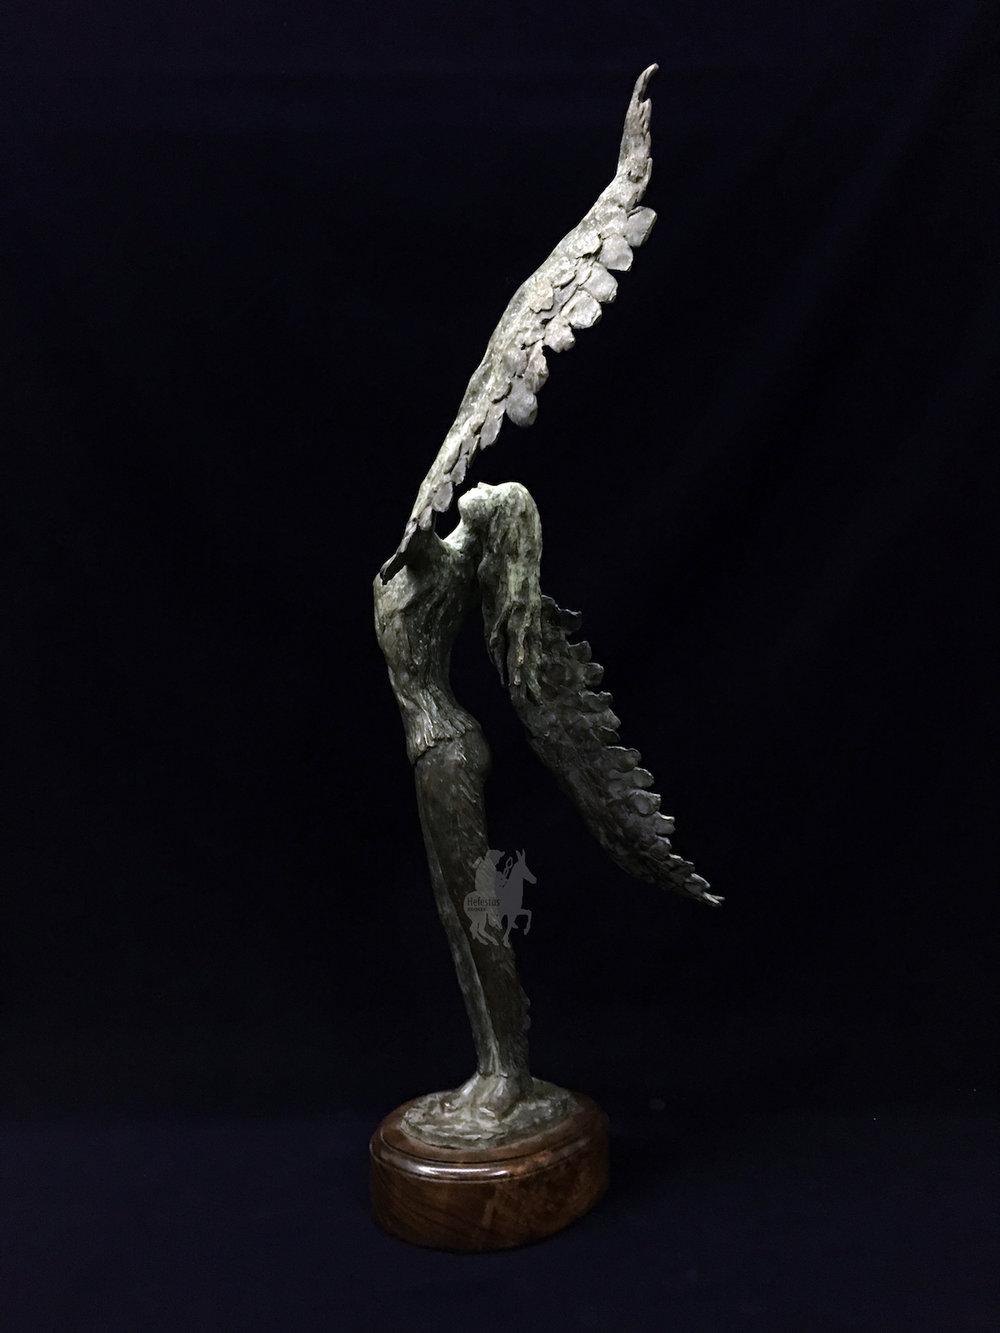 Raven-JerryVaughn-8.jpg